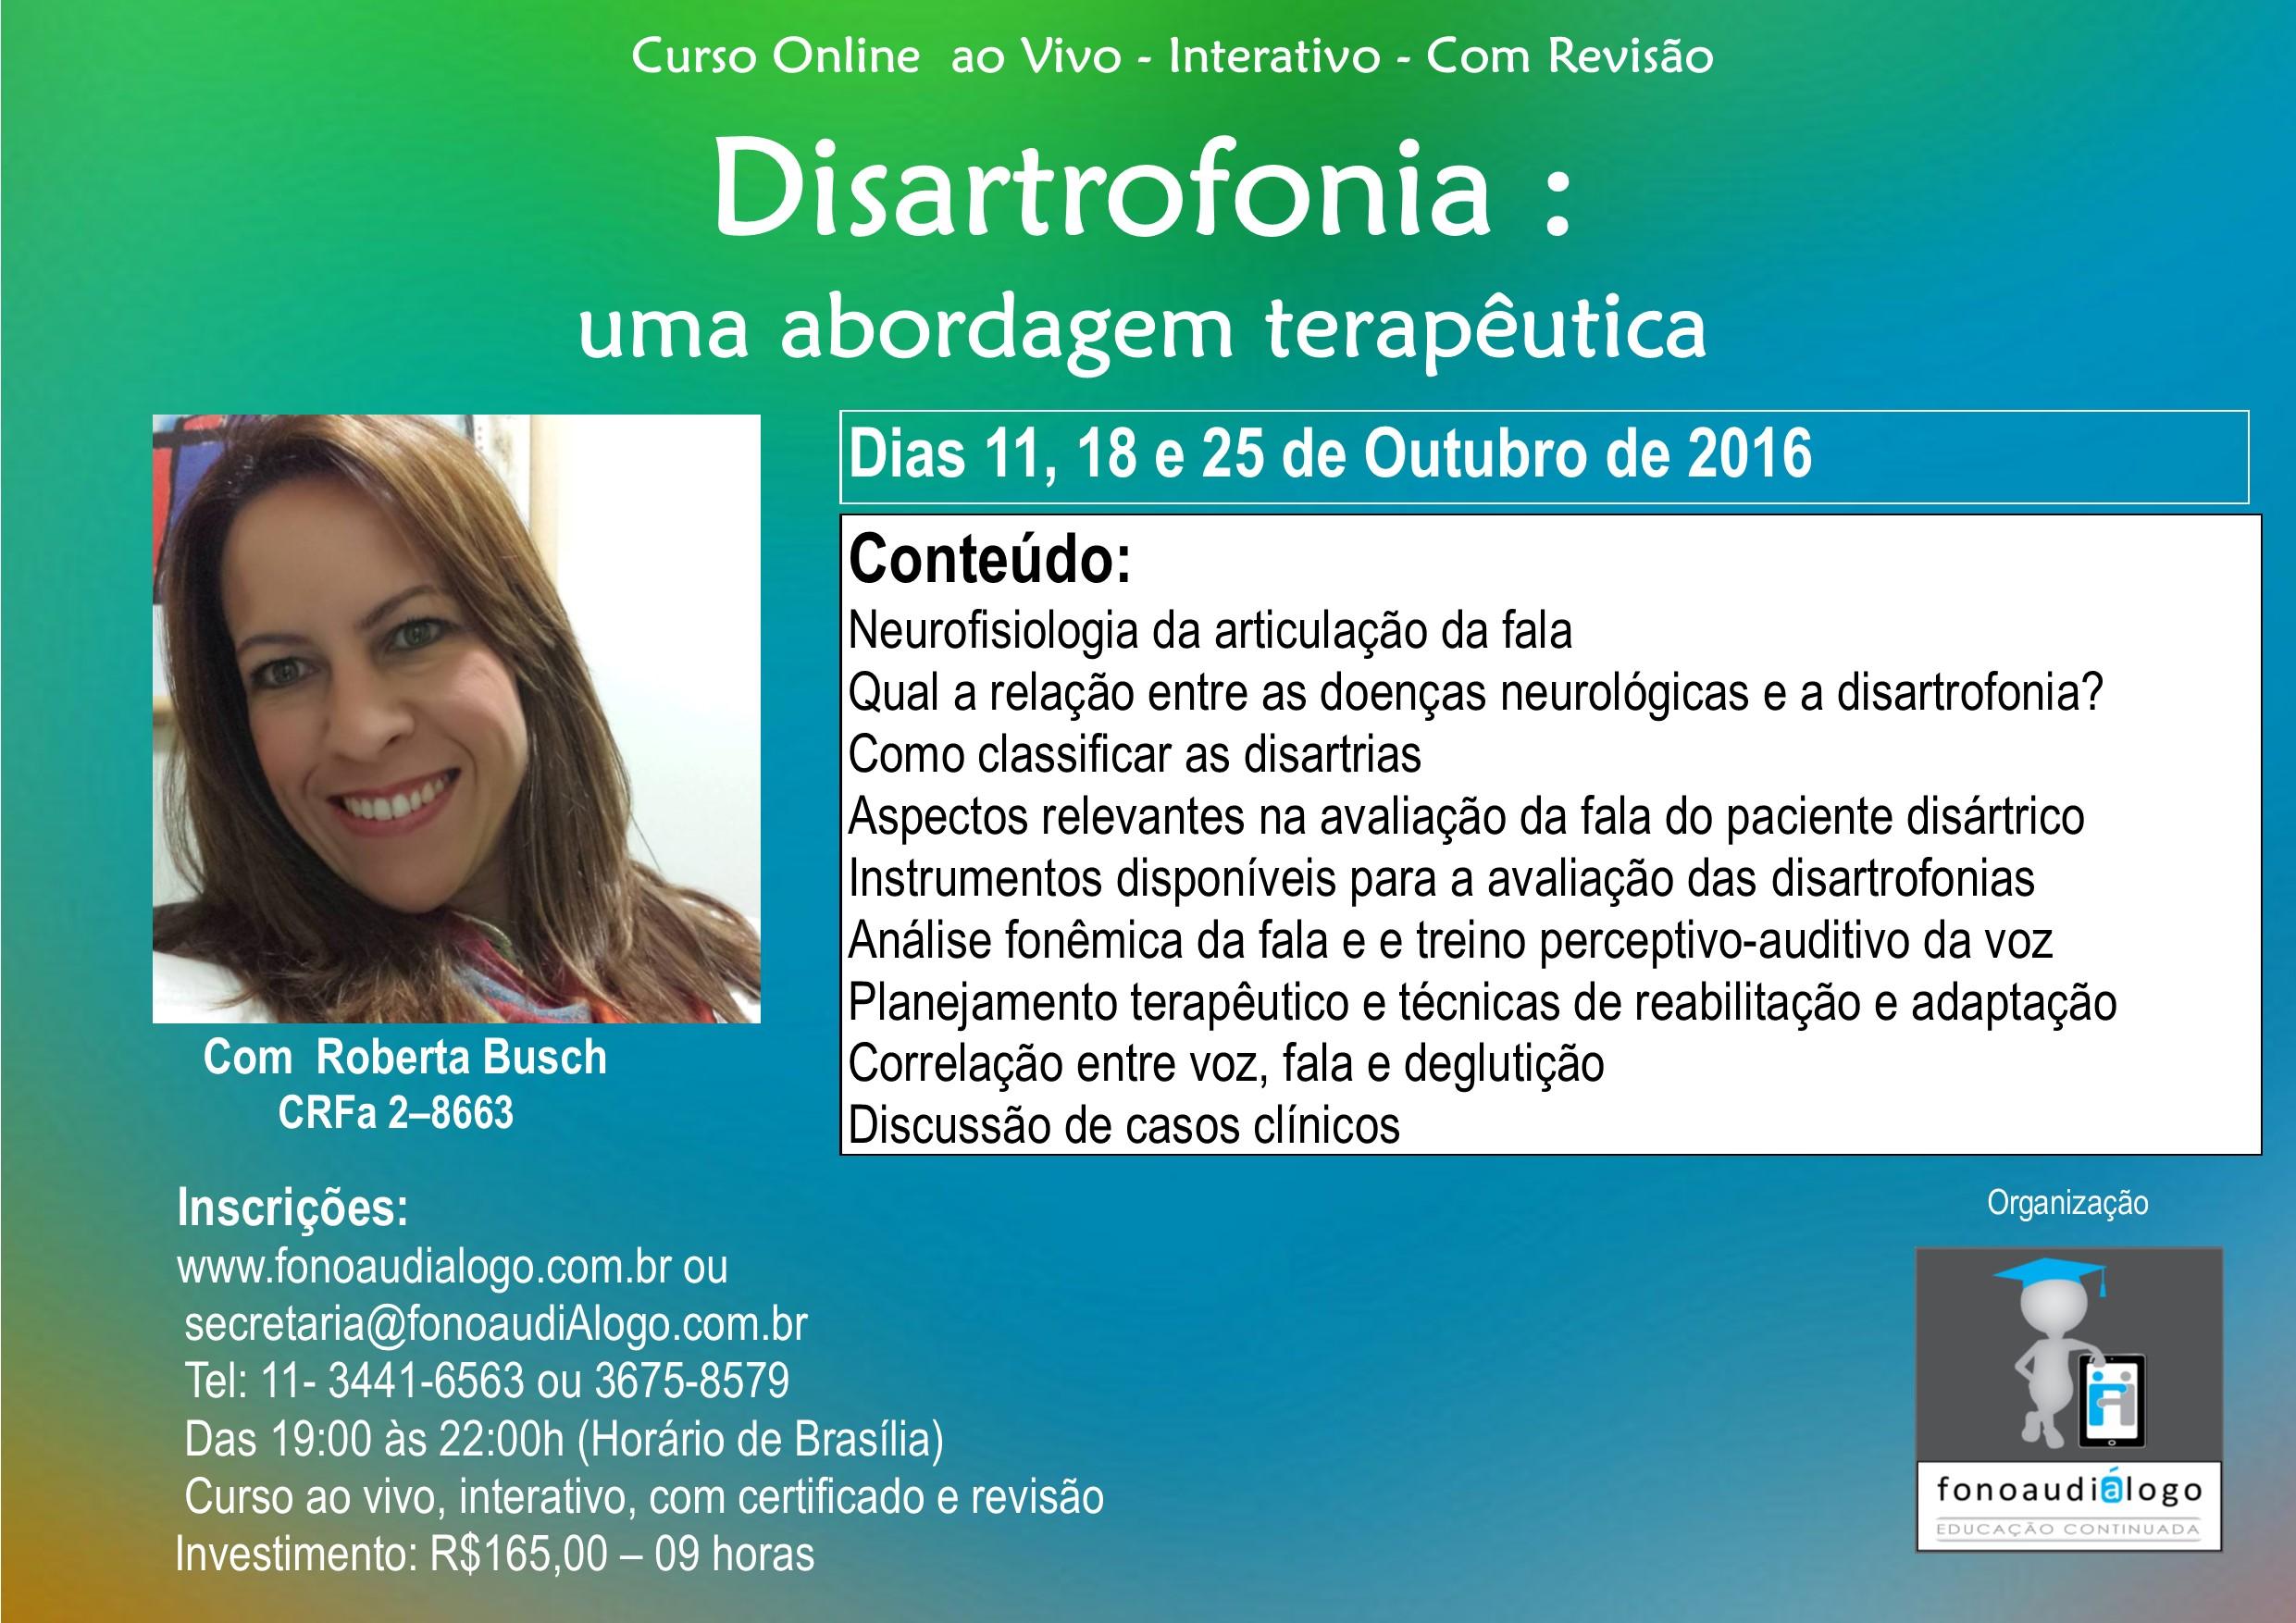 Disartrofonia